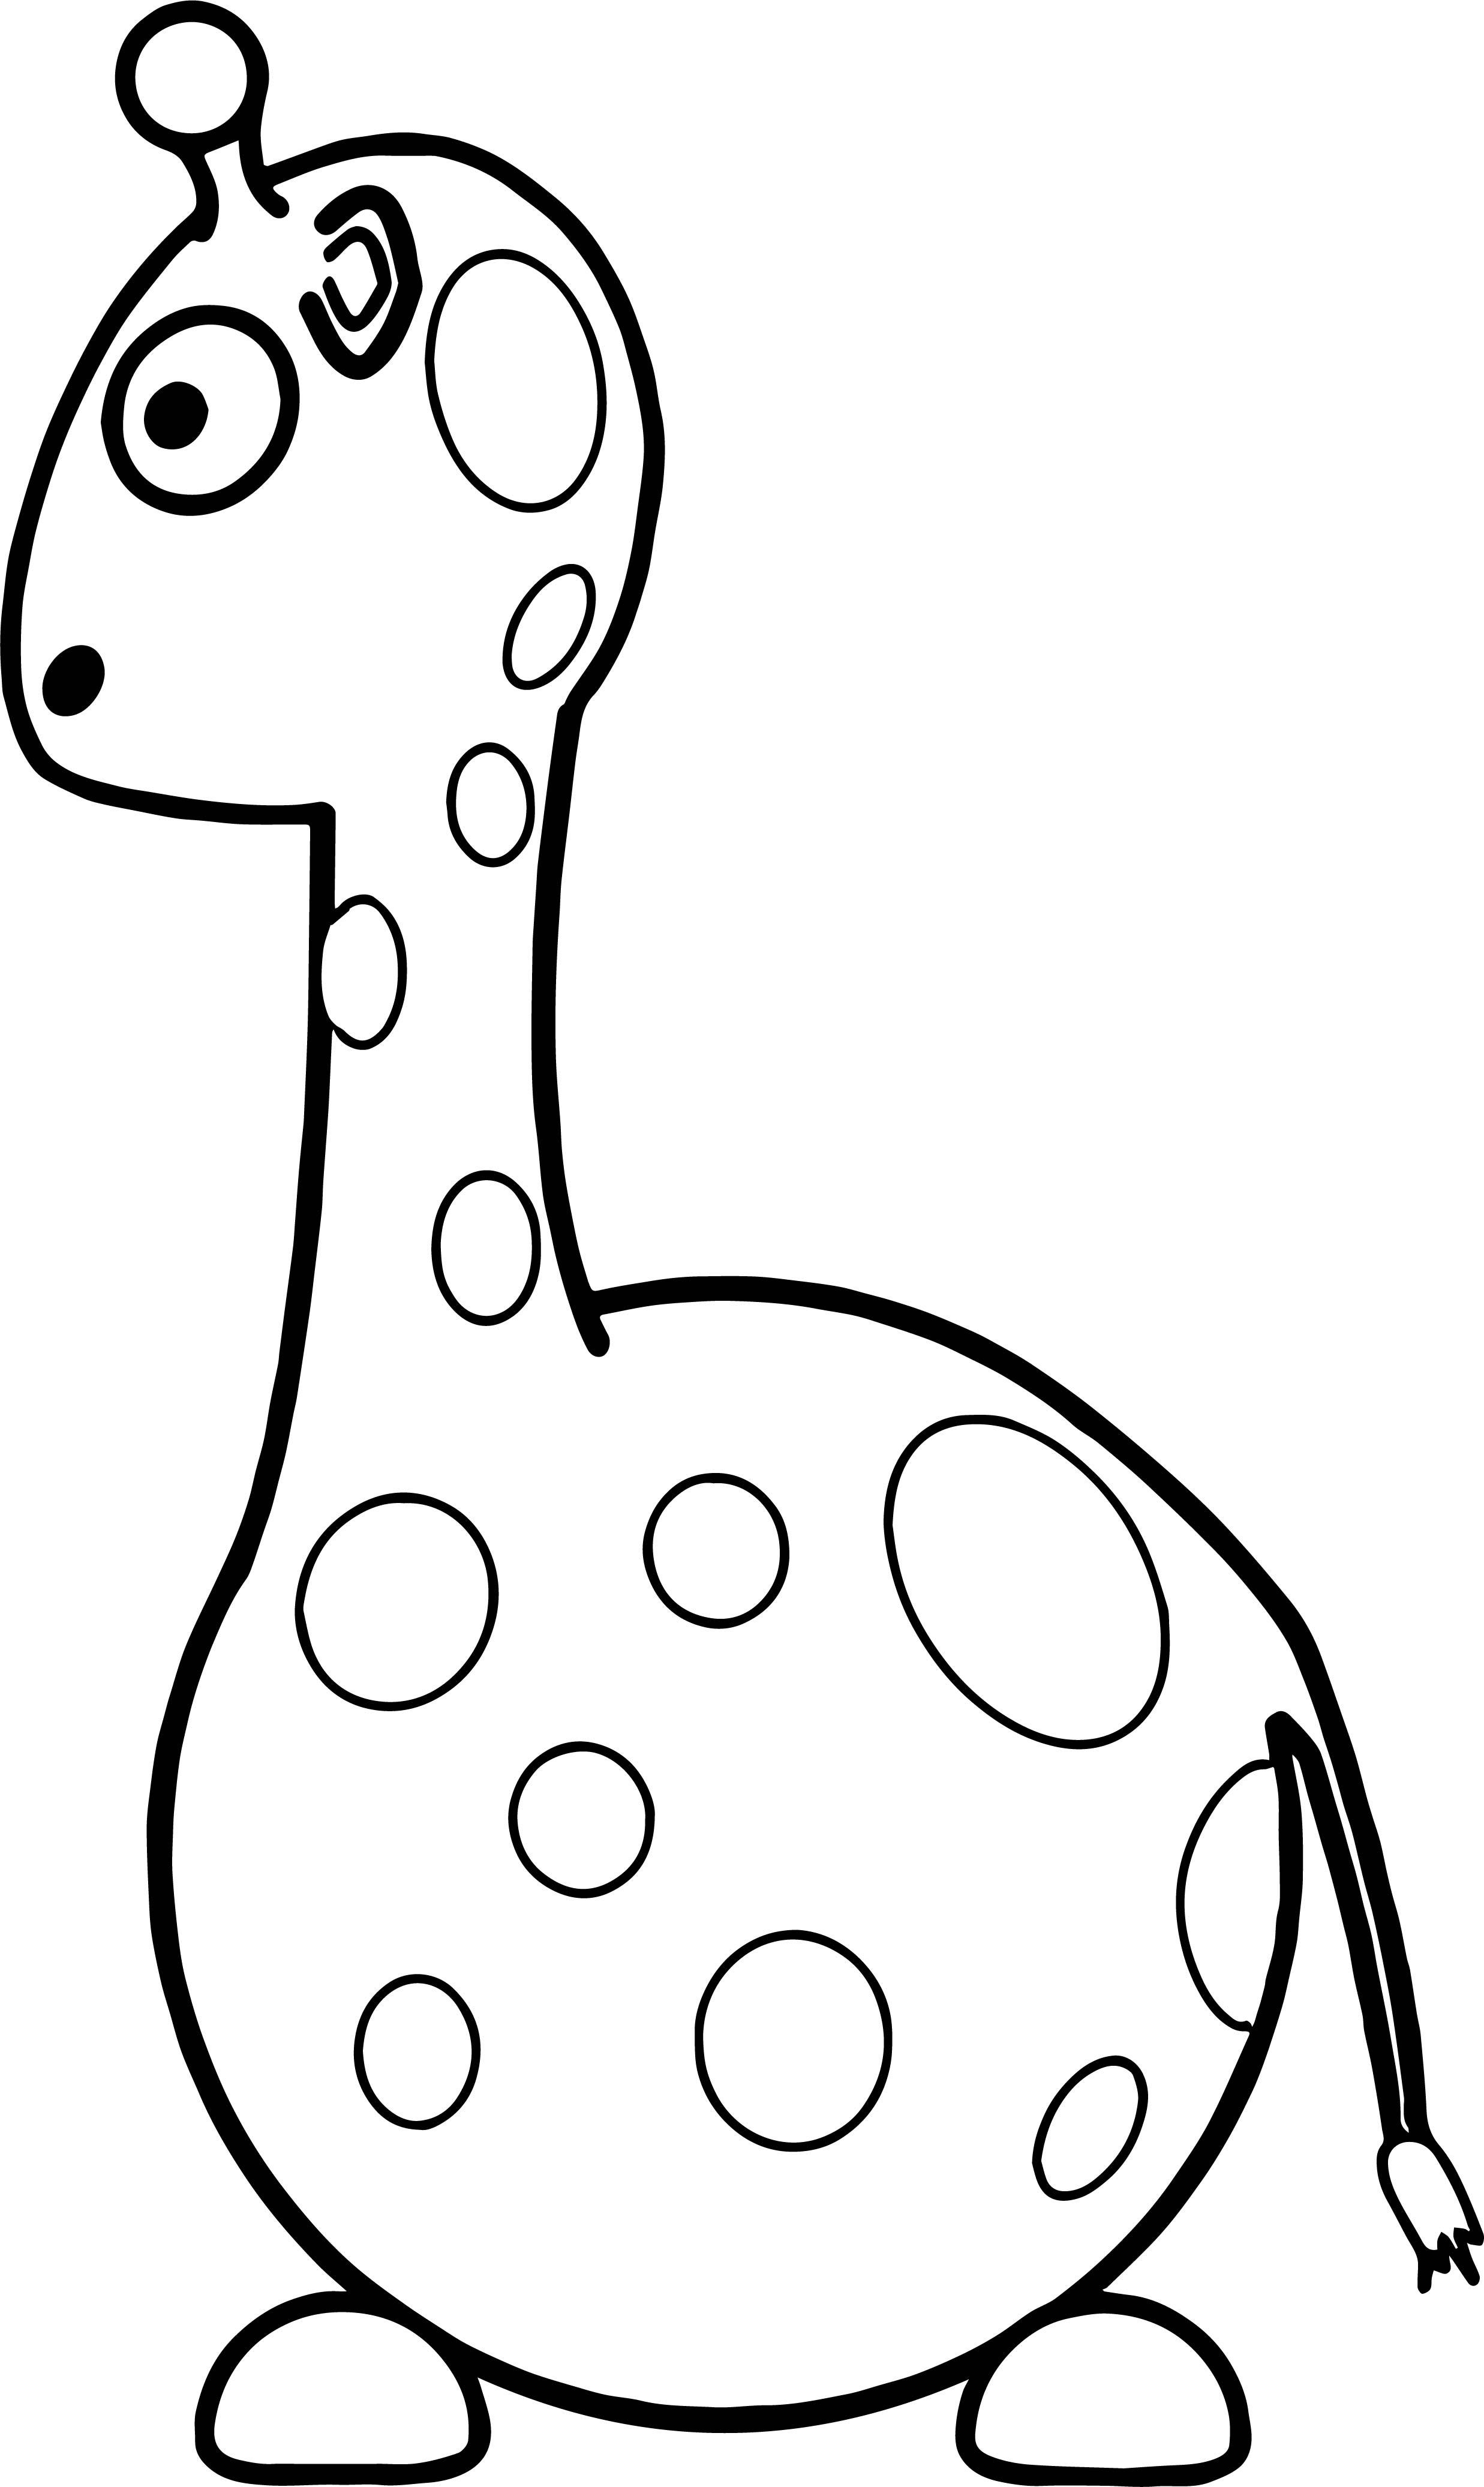 Giraffe Fat Coloring Page